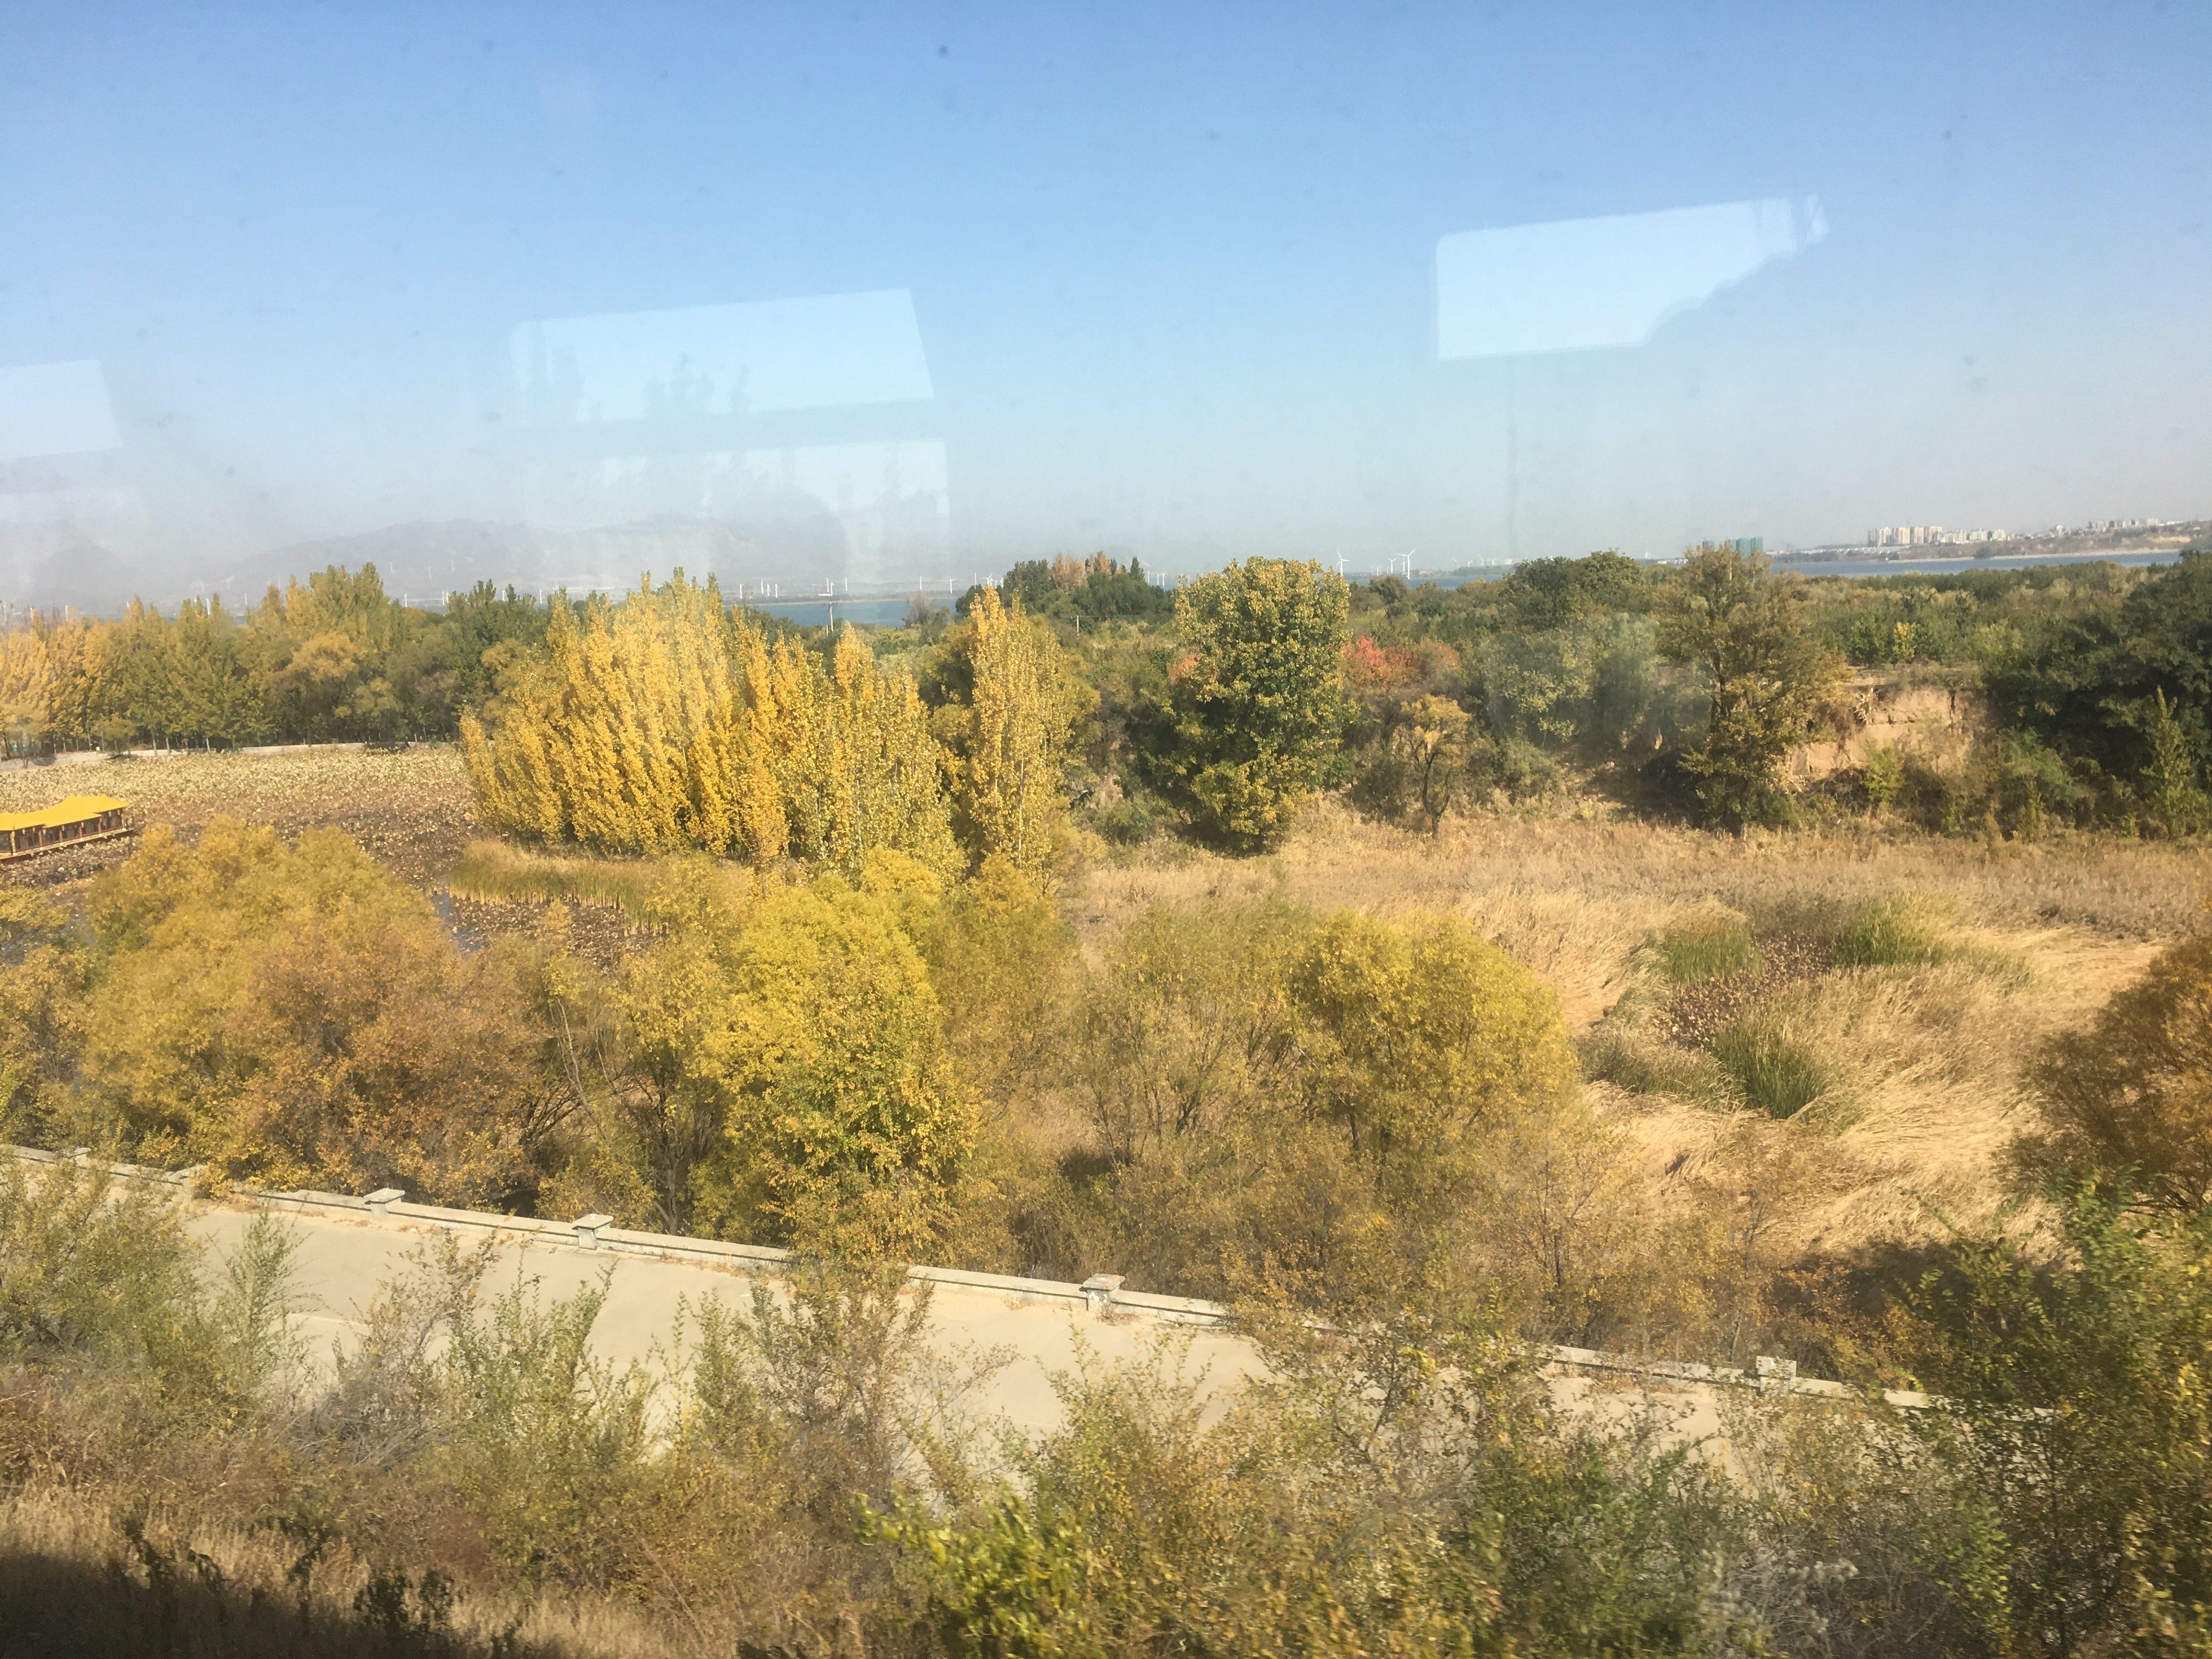 Autumn colour and Beijing city on the horizon